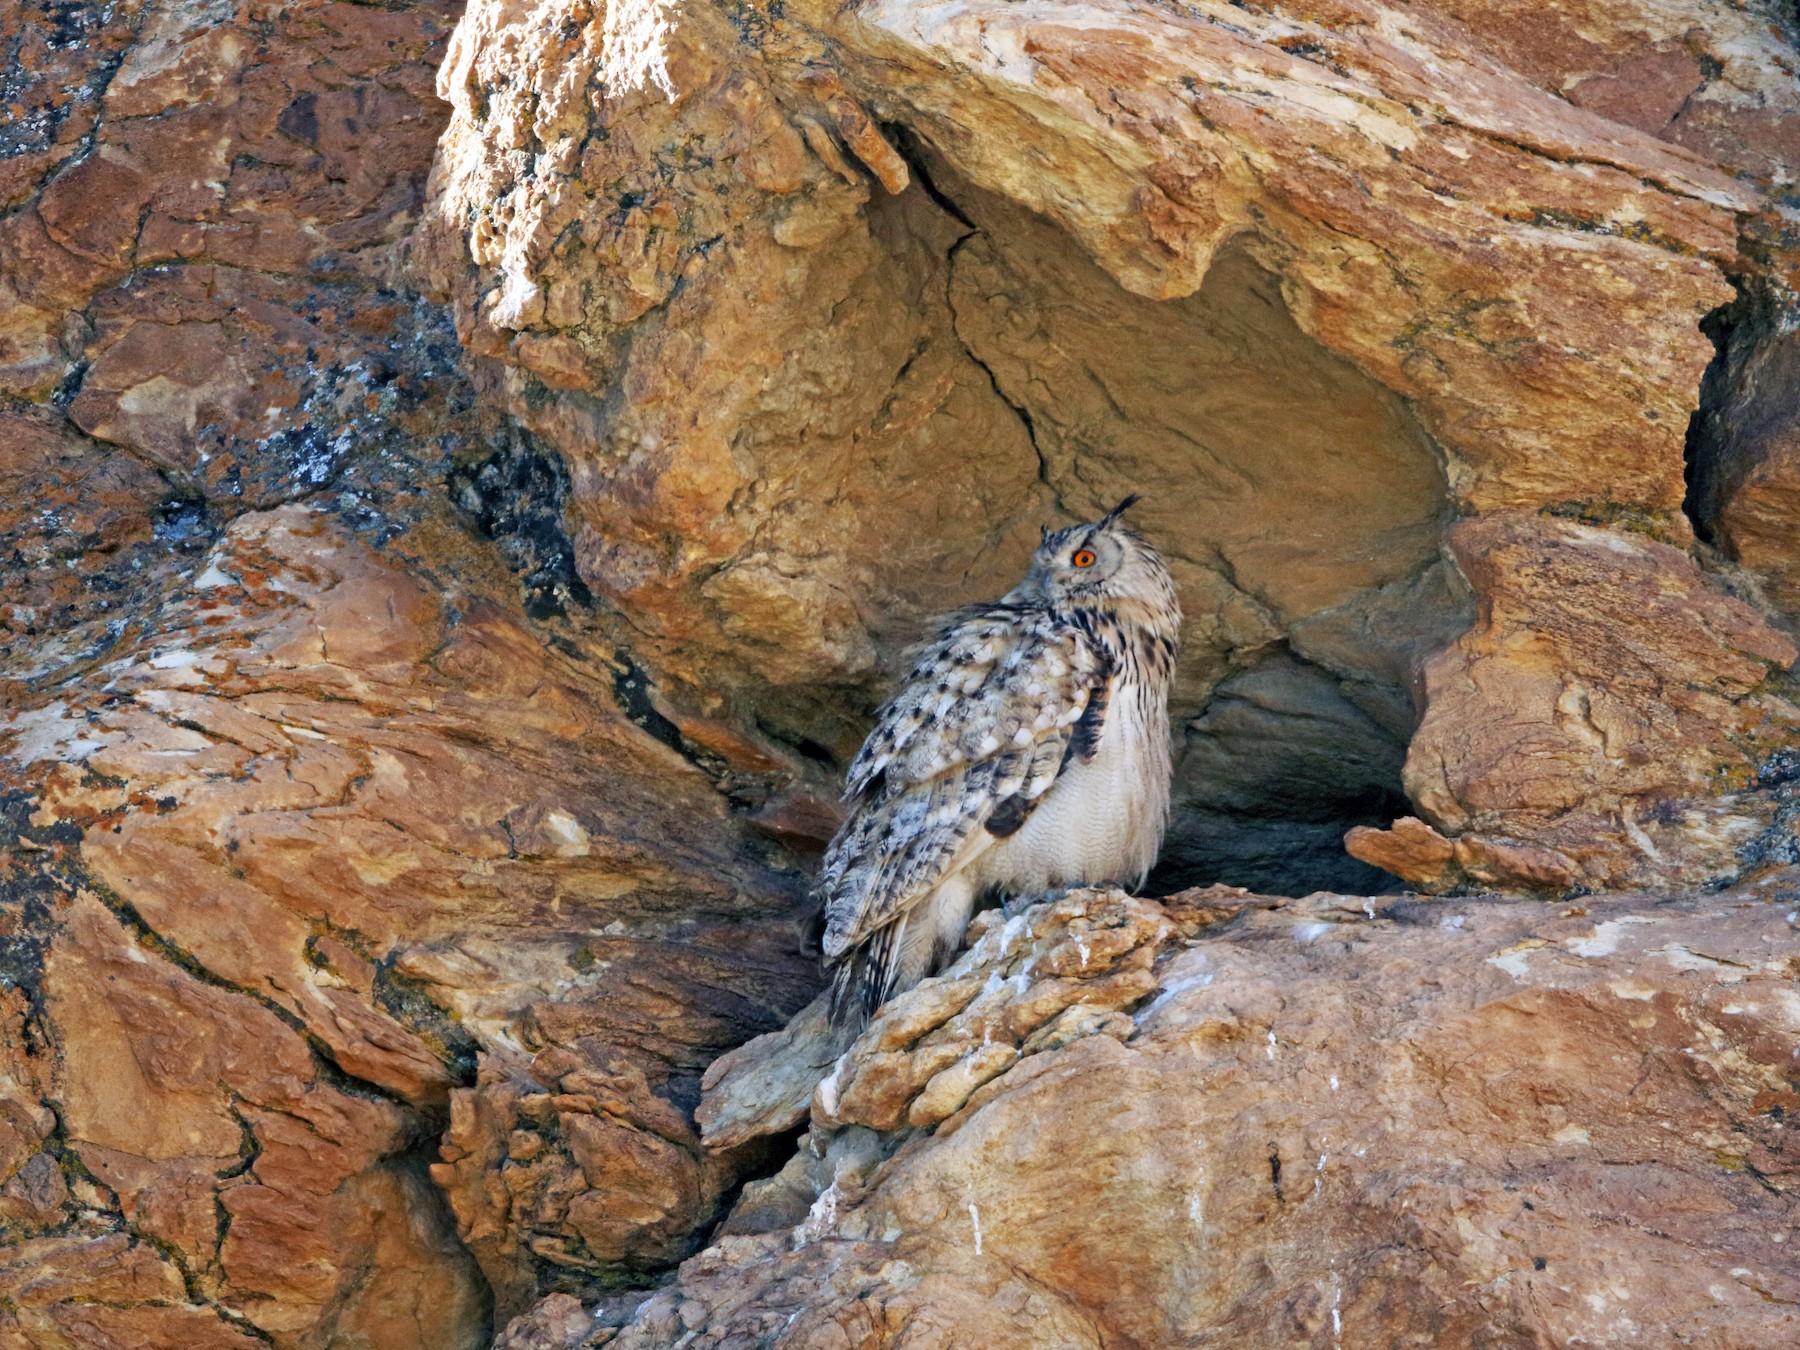 Eurasian Eagle-Owl - Esha Munshi